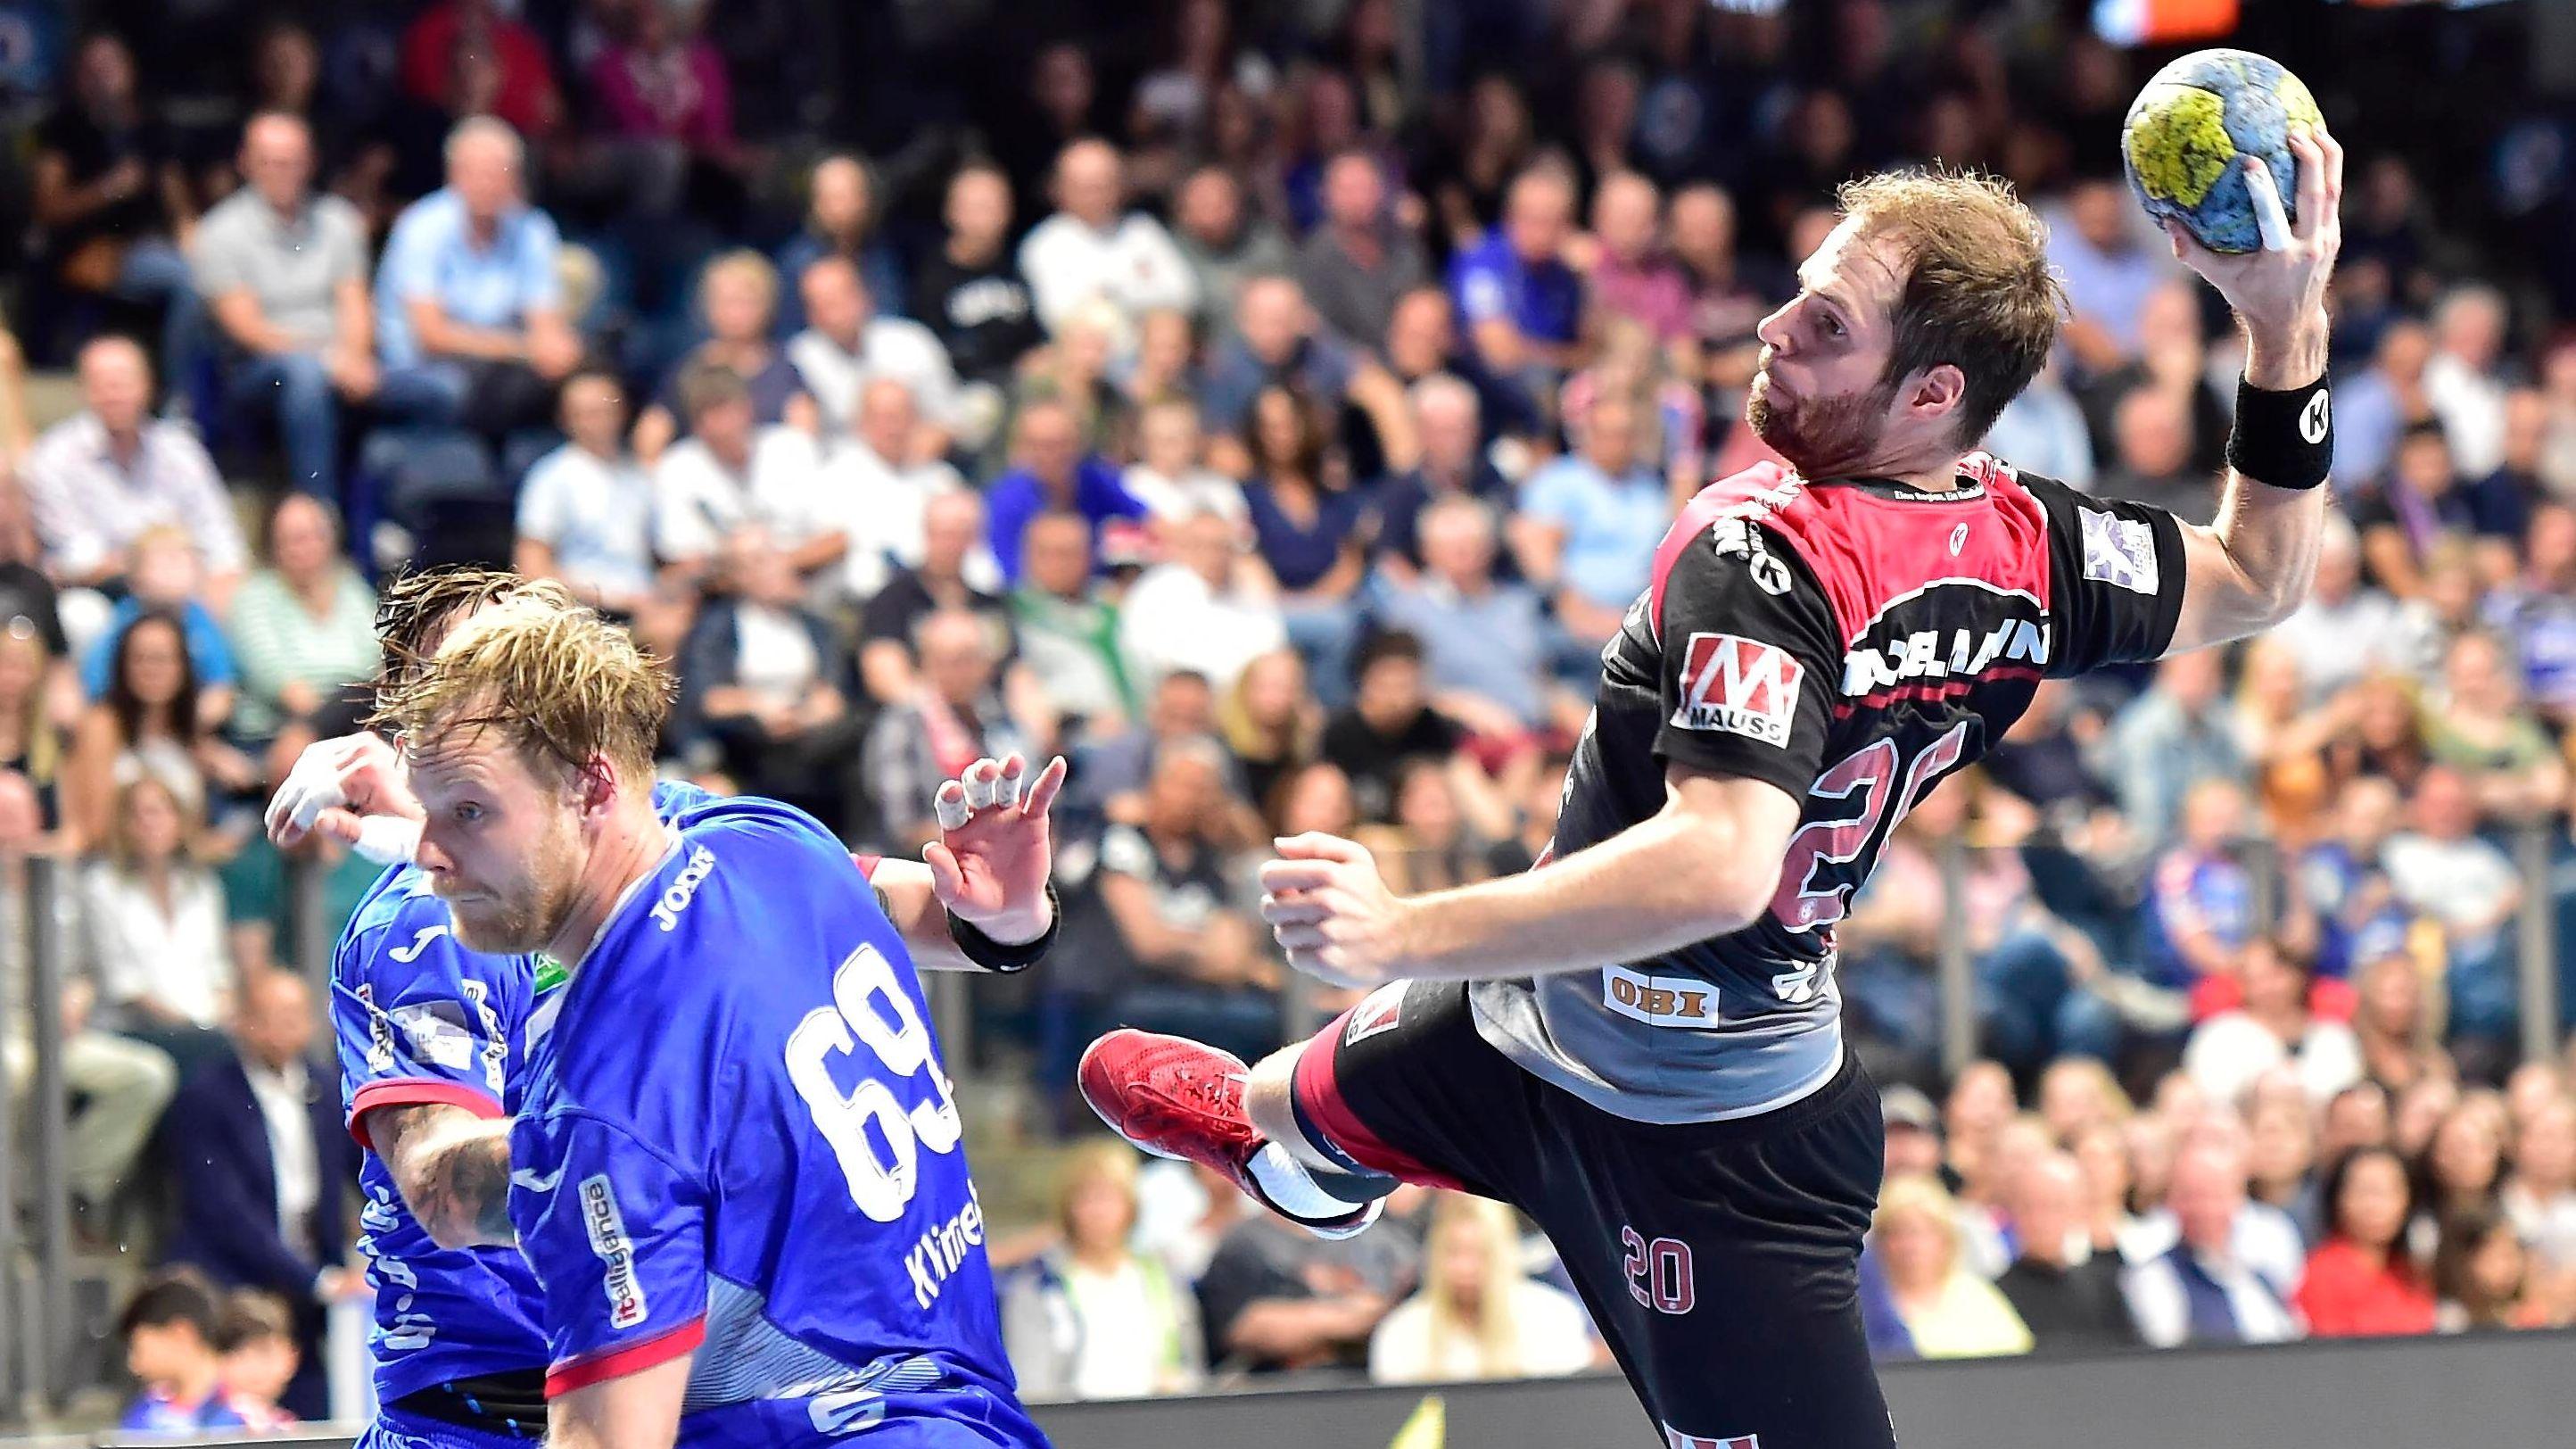 Spielszene HC Erlangen - TBV Lemgo